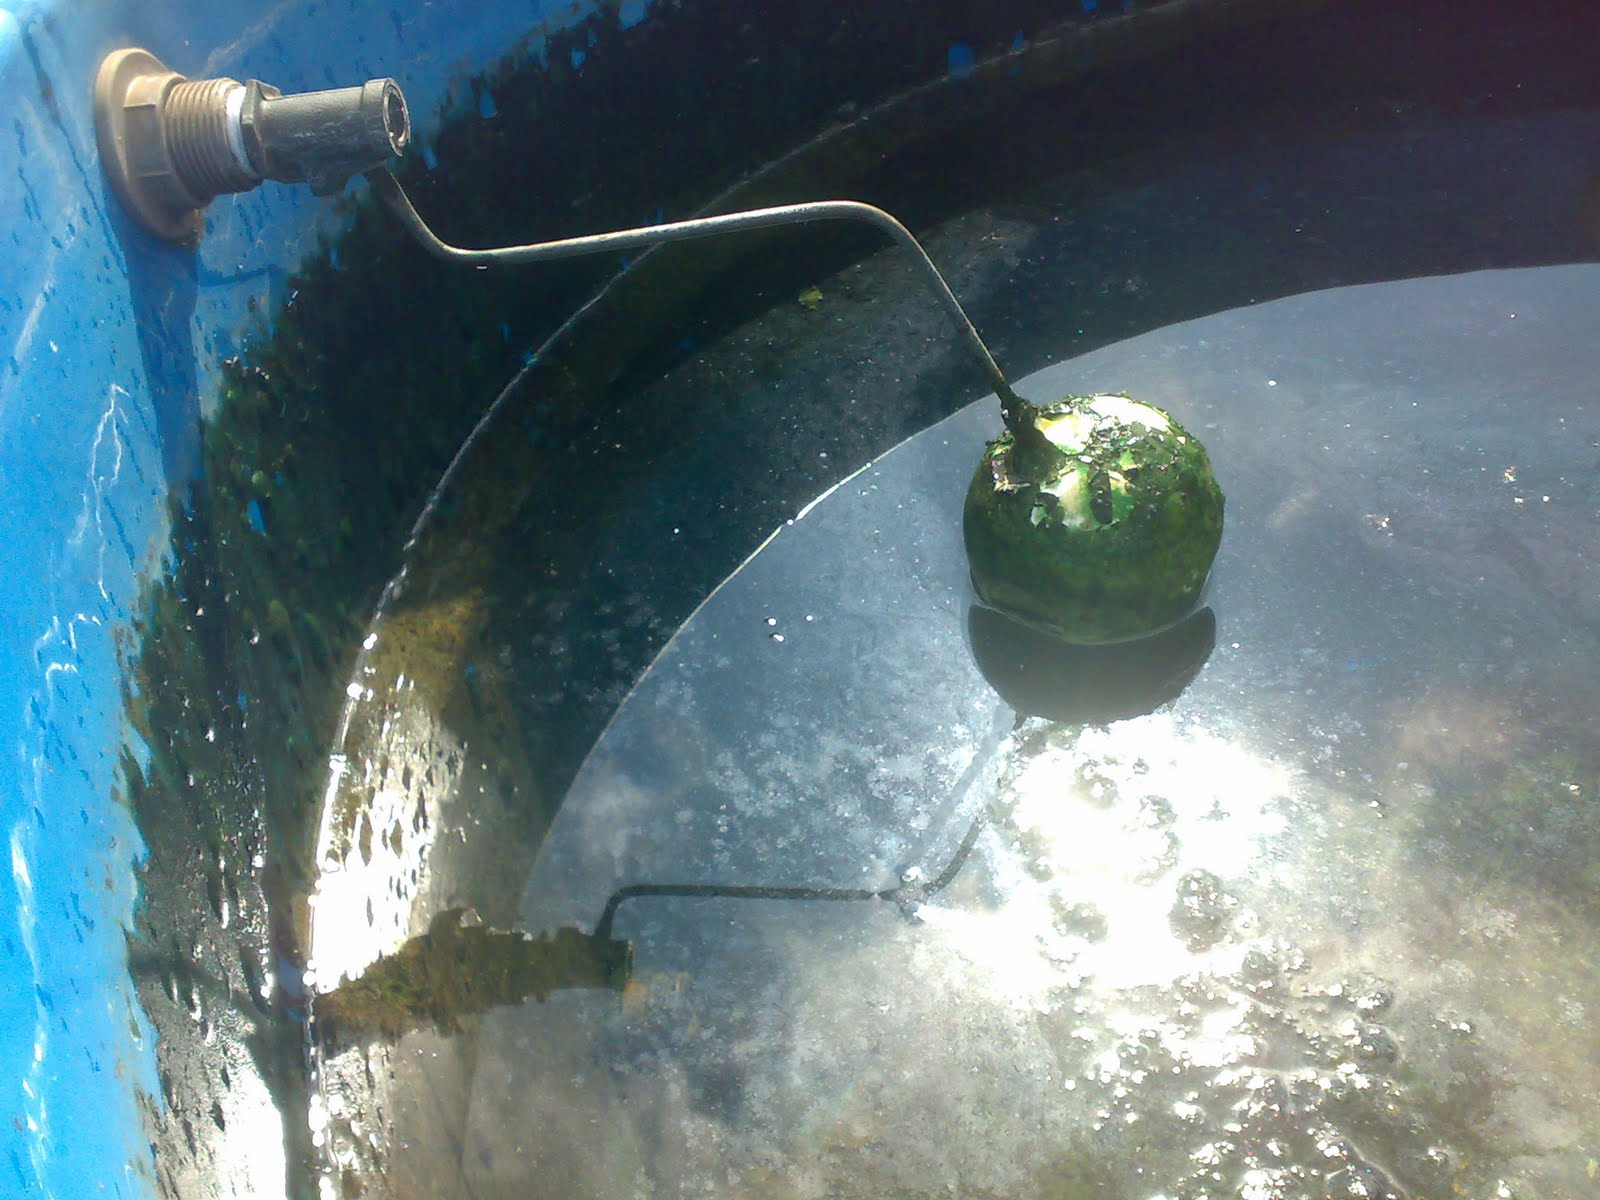 Importância da Limpeza de Caixas D'água #0B8BC0 1600x1200